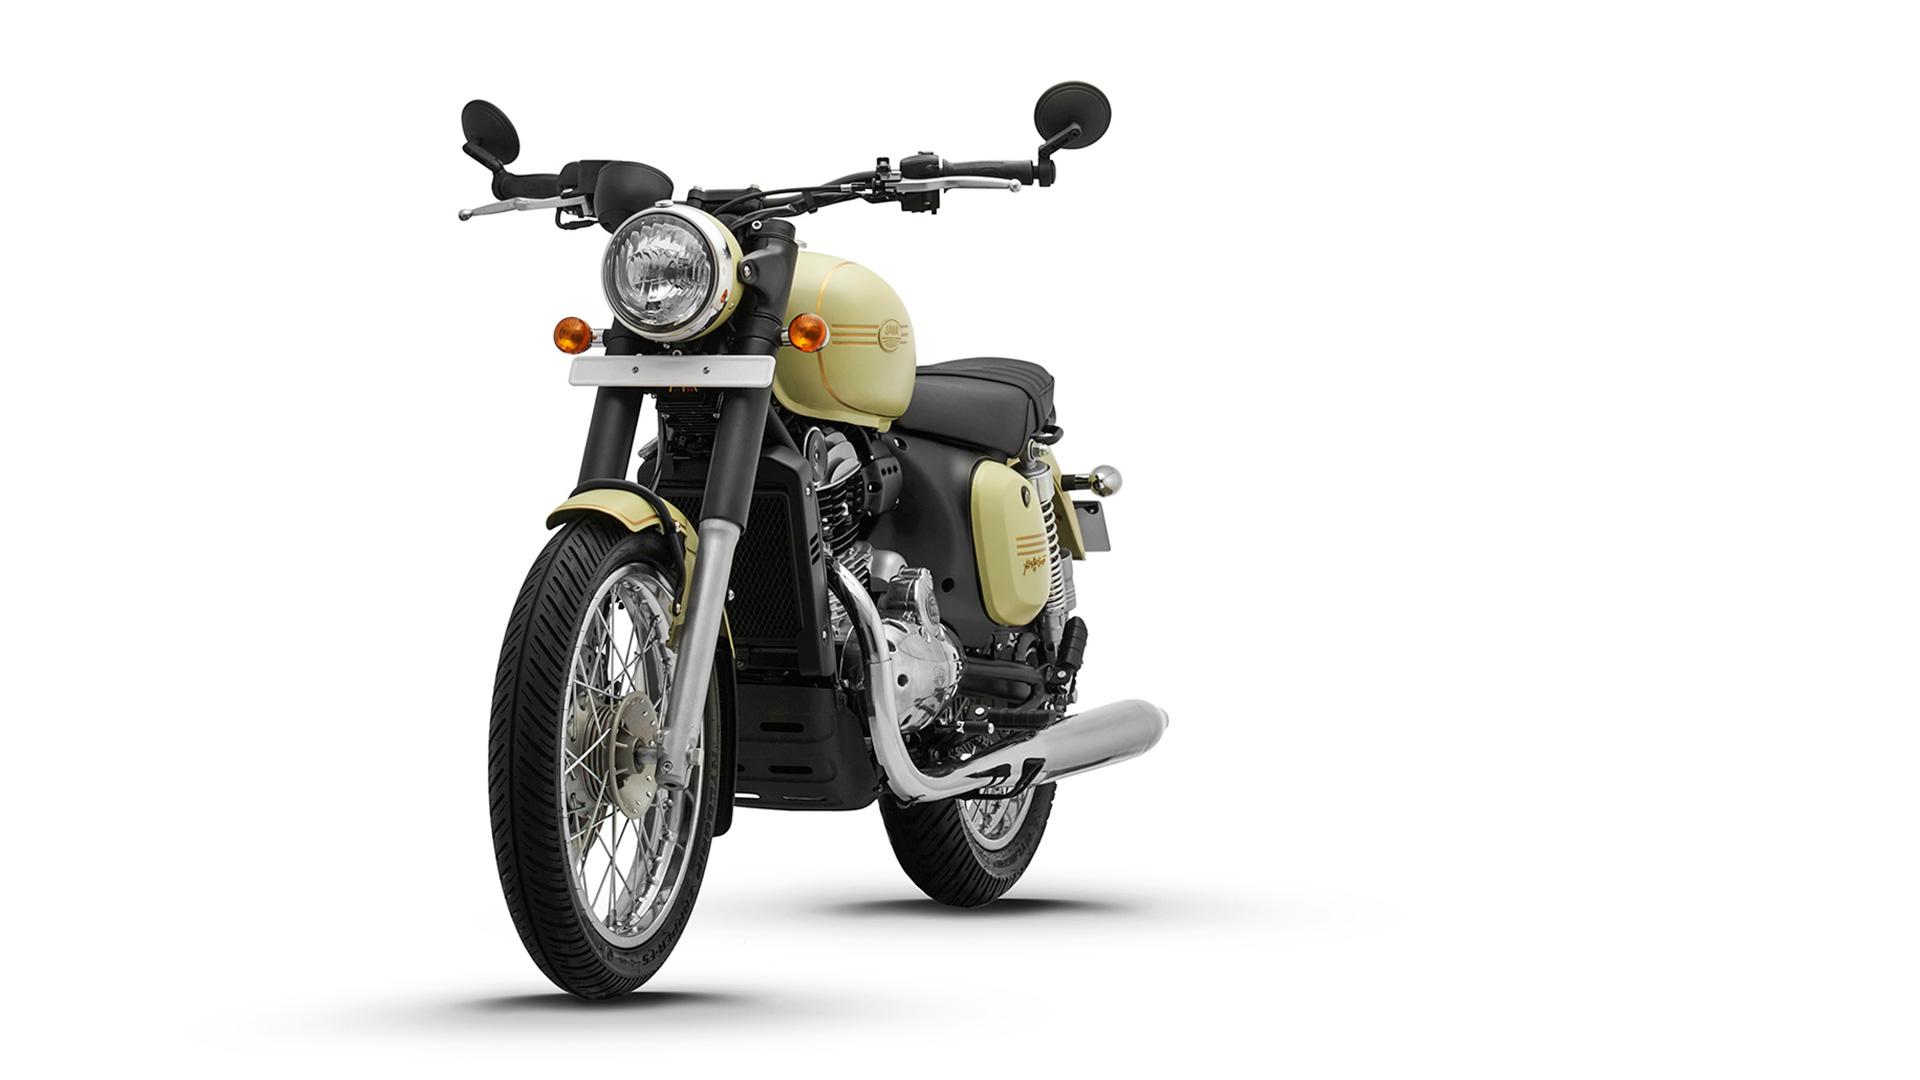 Jawa Motorcycles Jawa Forty Two 2018